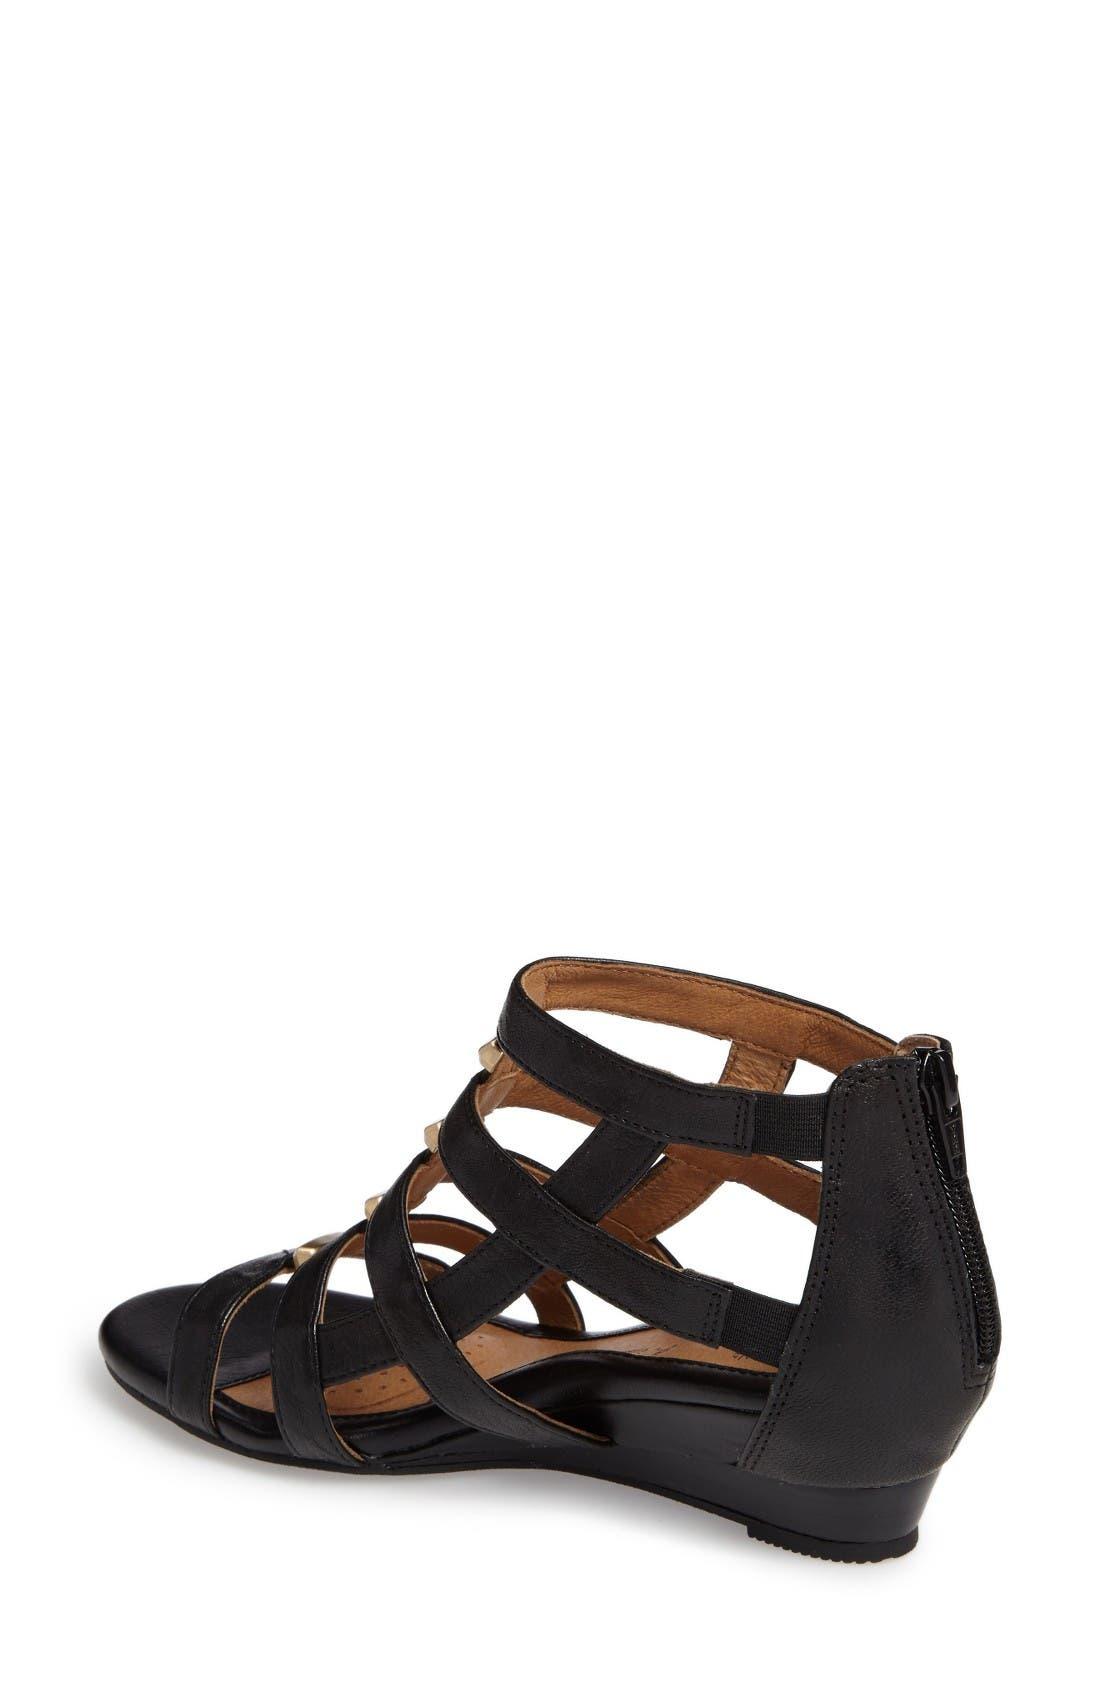 Rio Gladiator Wedge Sandal,                             Alternate thumbnail 2, color,                             Black Leather